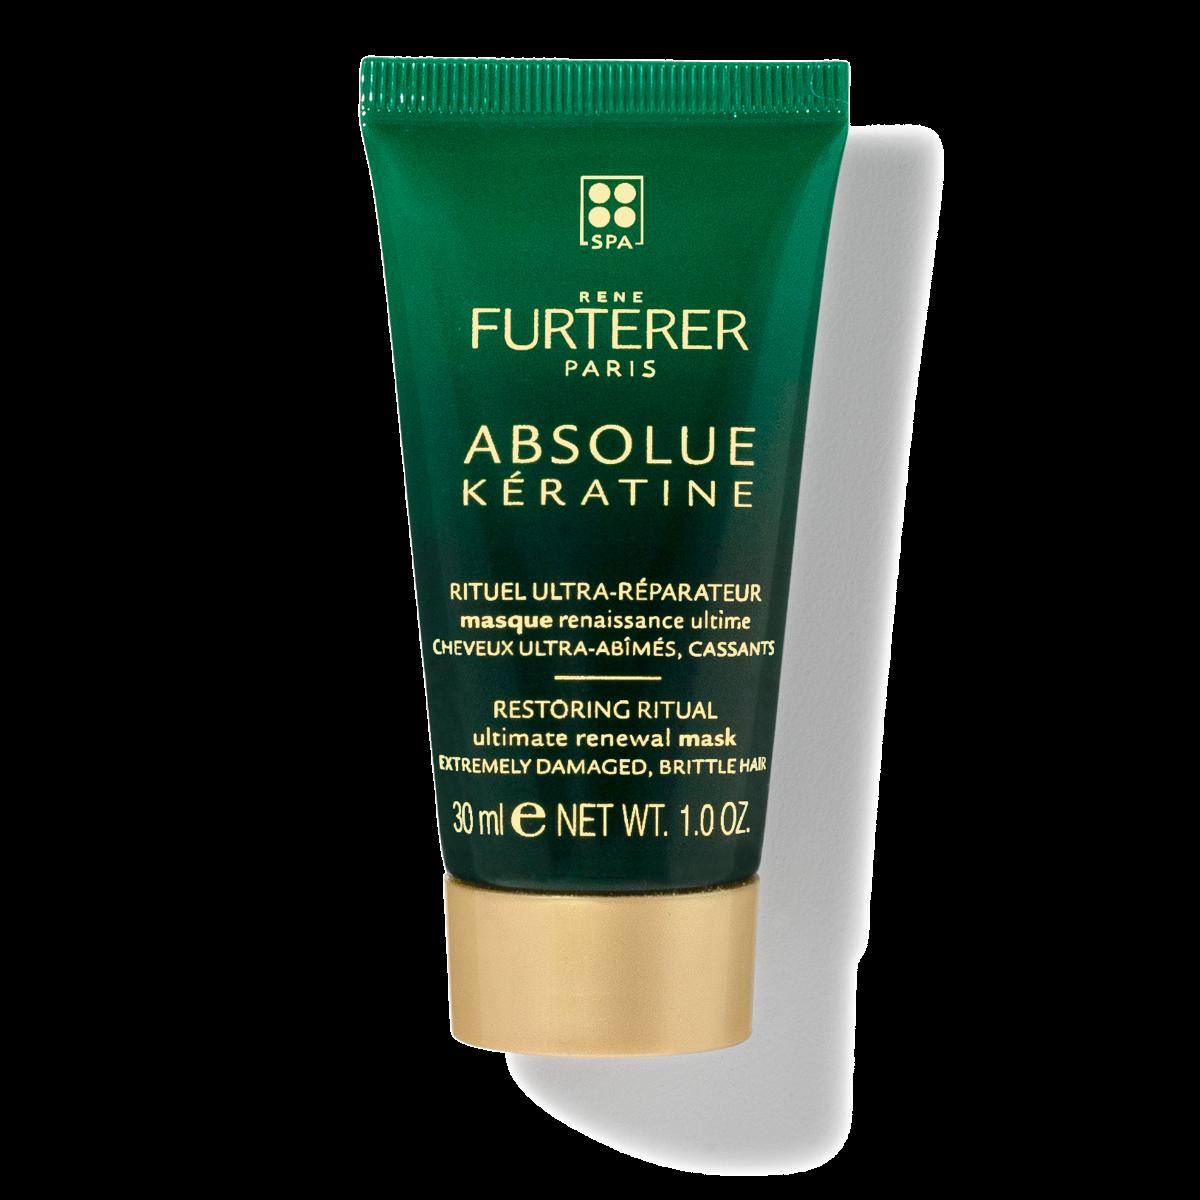 Rene Furterer ABSOLUE KERATINE Ultimate Renewal Mask